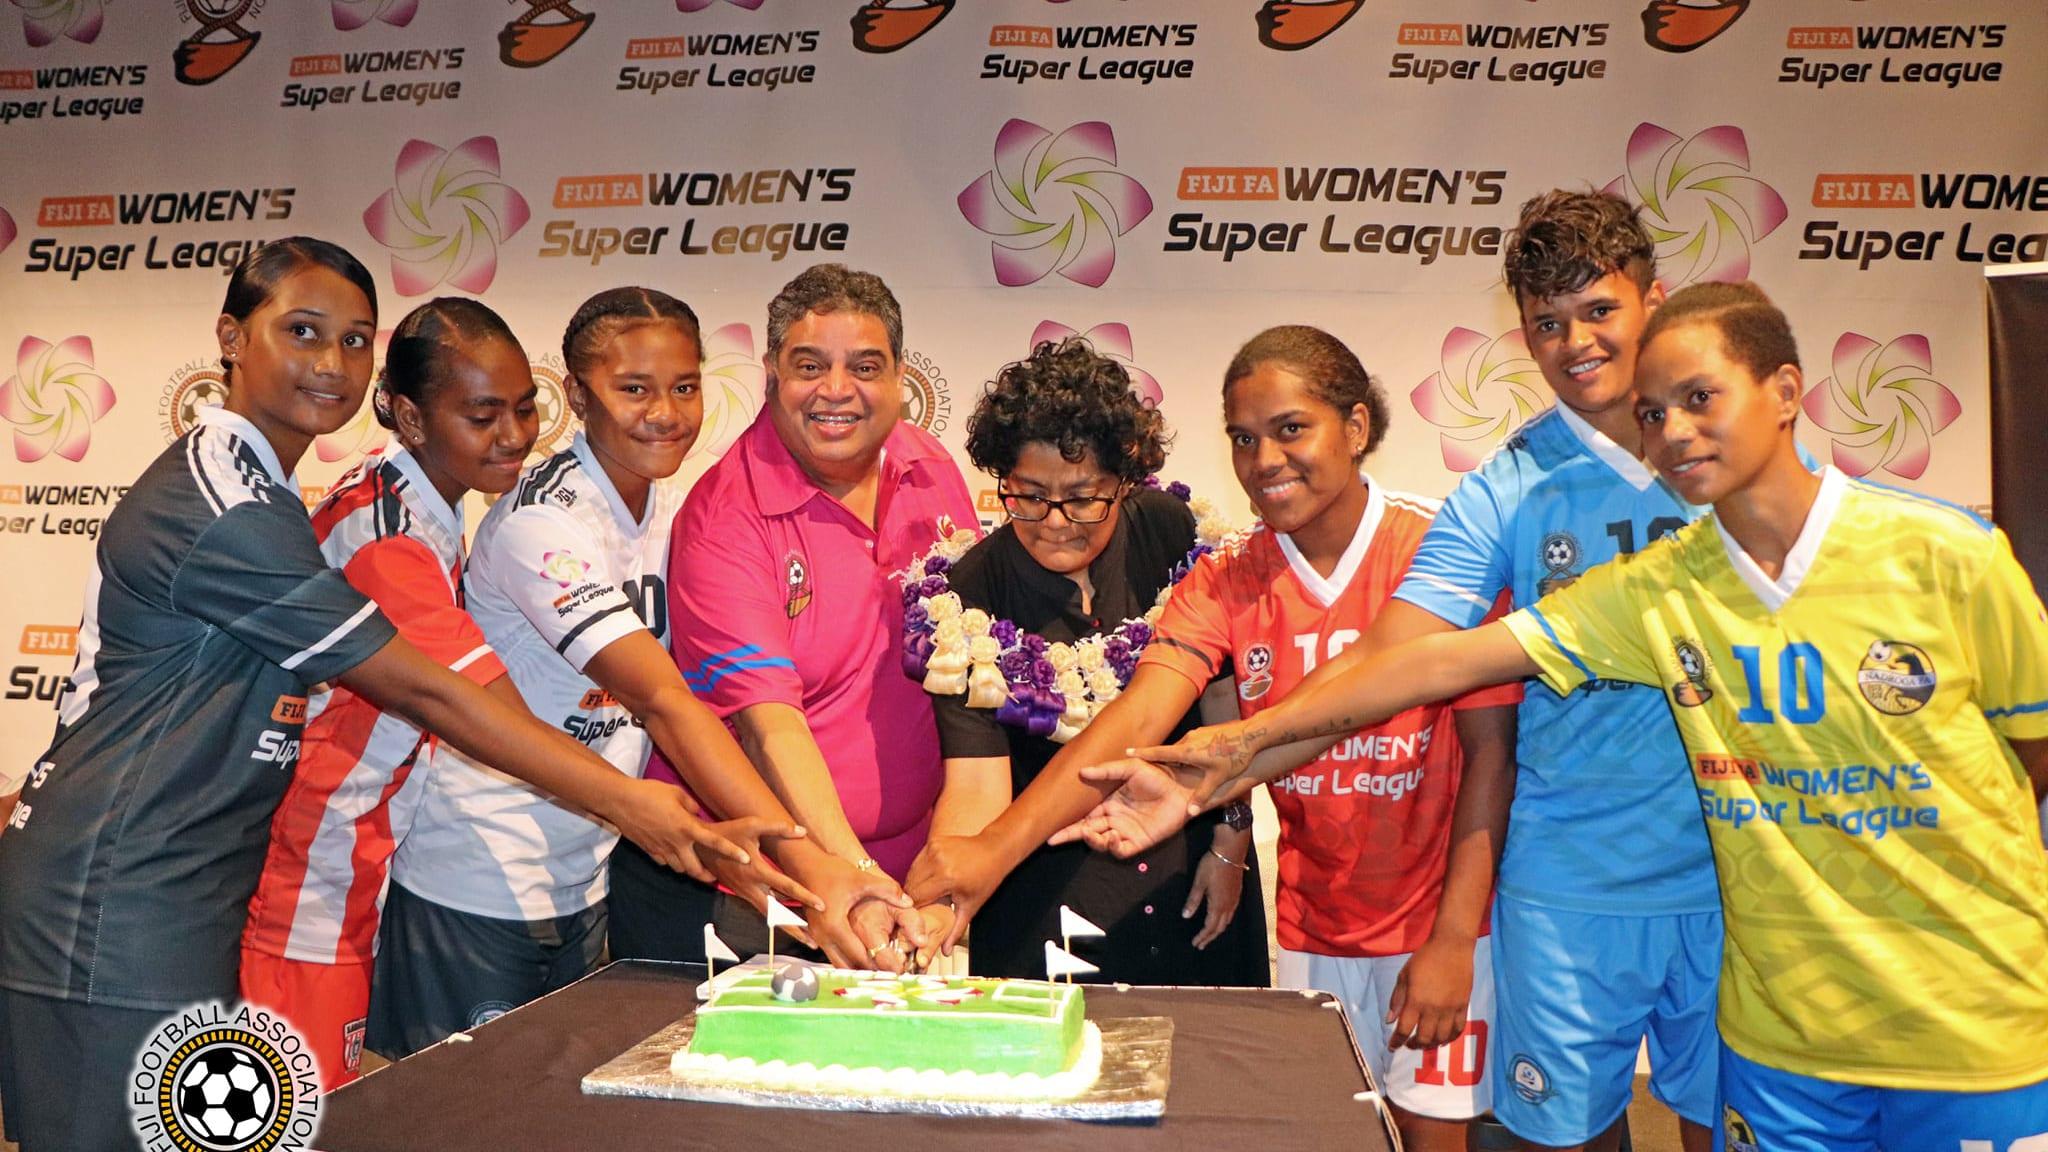 Women's Football - News - Fiji breaks new ground ahead of the 2023 World Cup